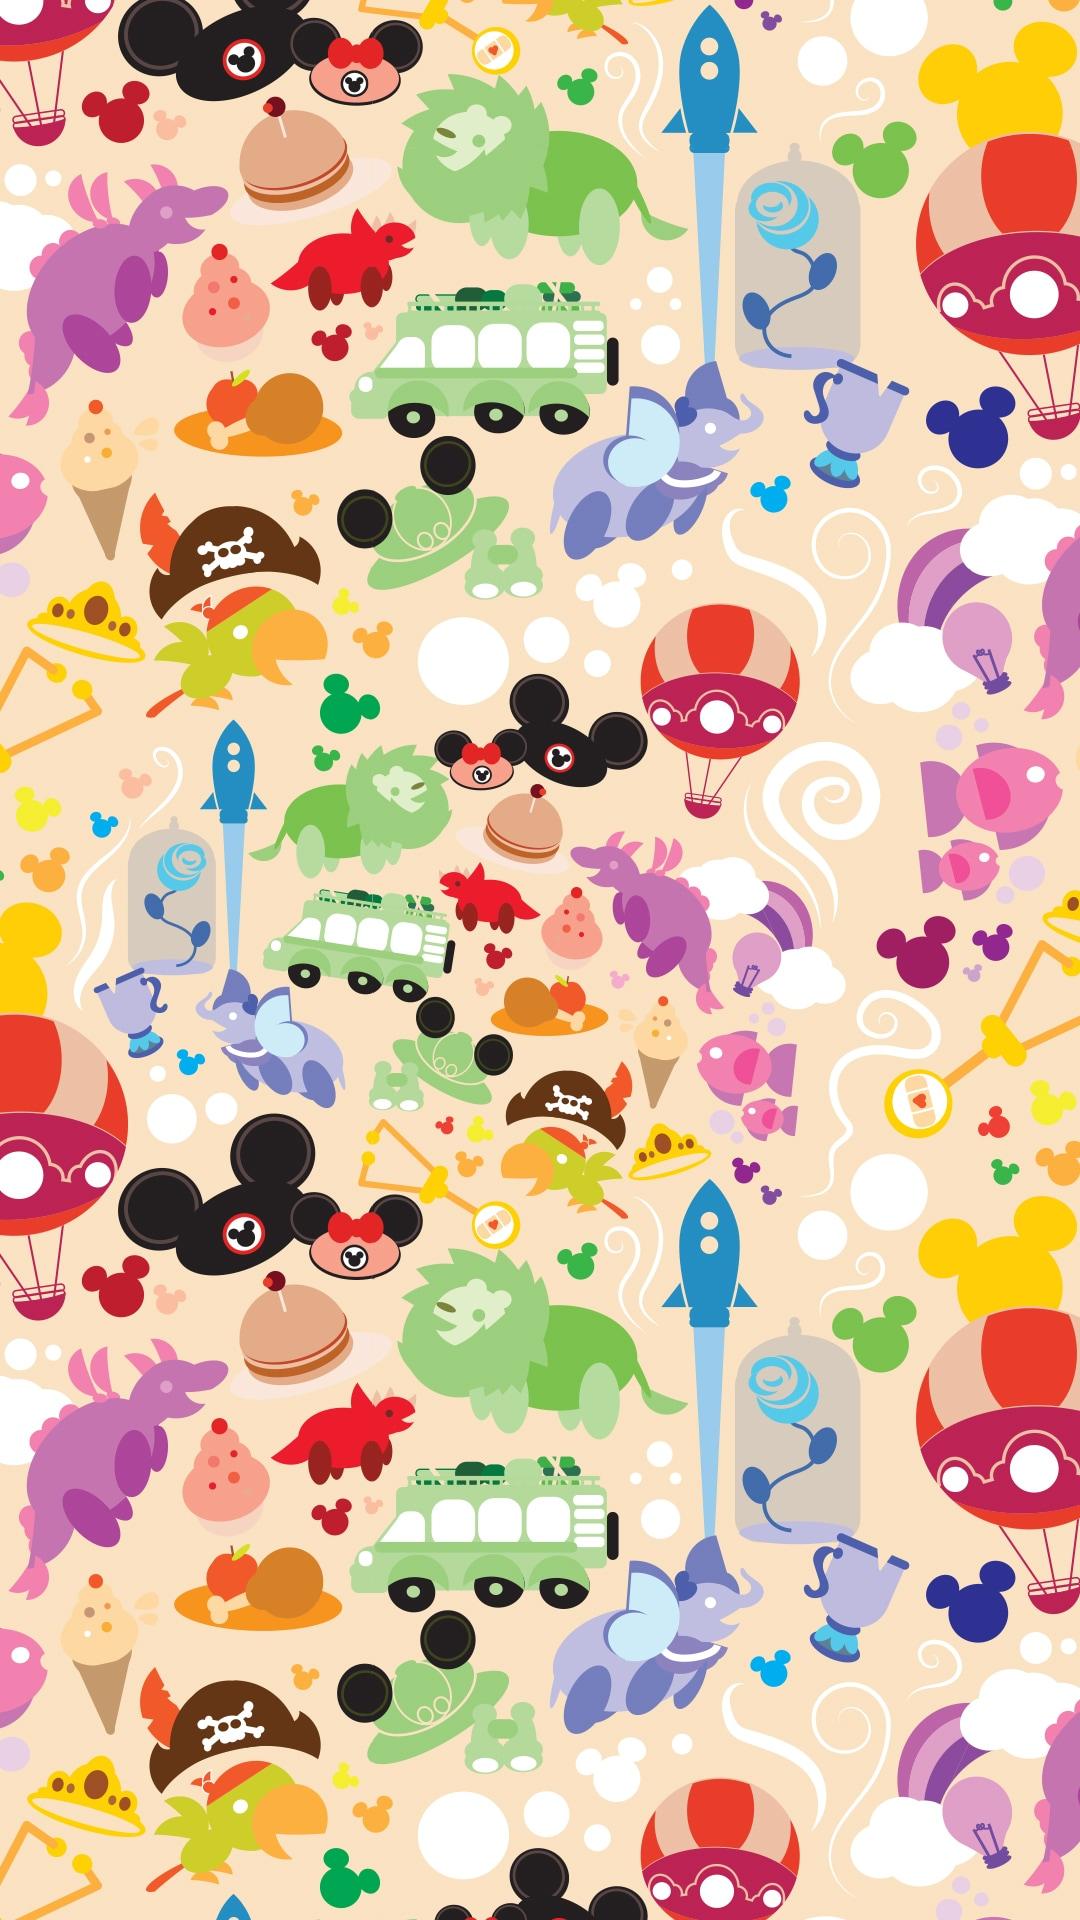 Disneykids Download Our Playful Walt Disney World Resort